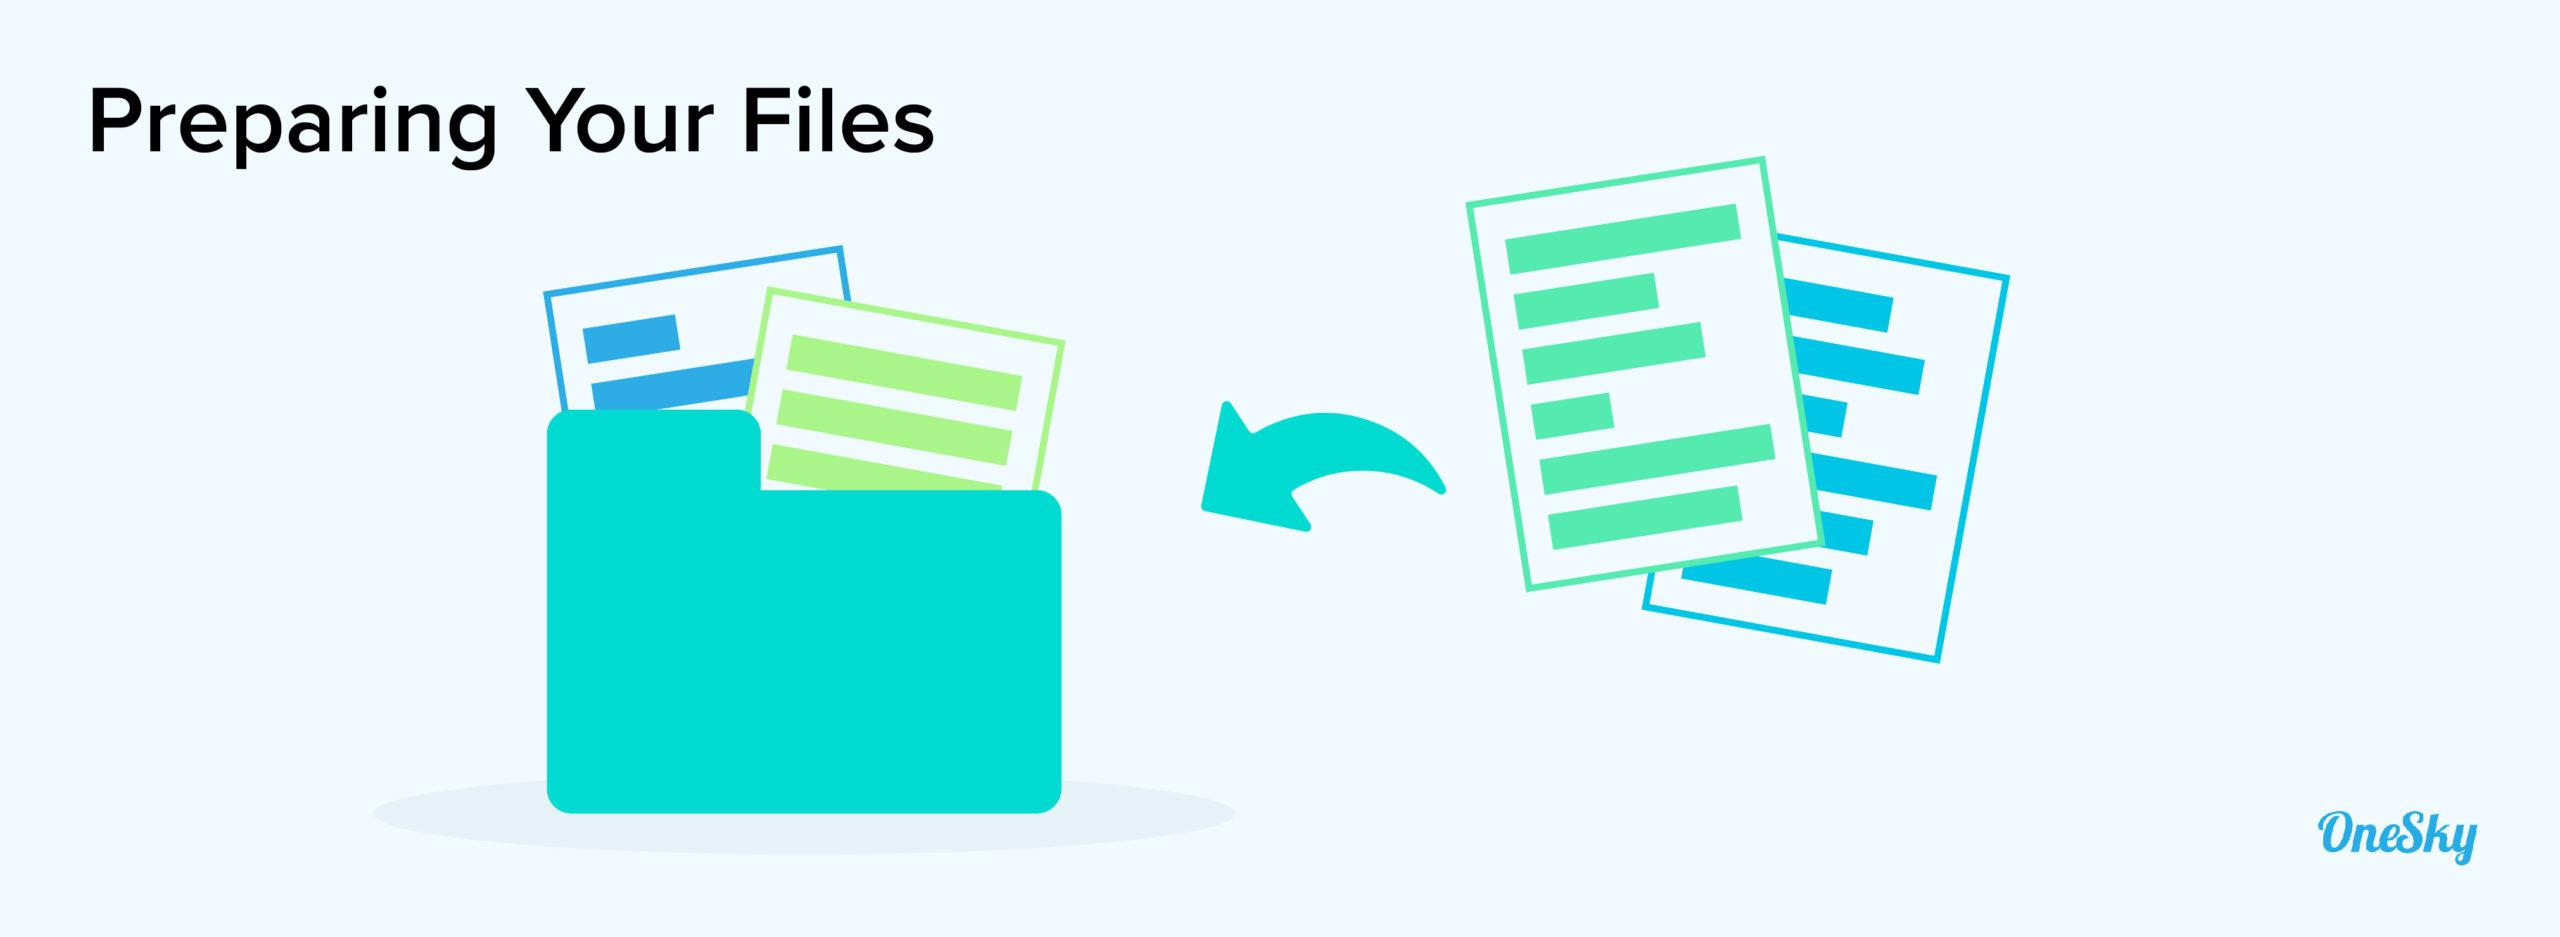 Preparing Your Files